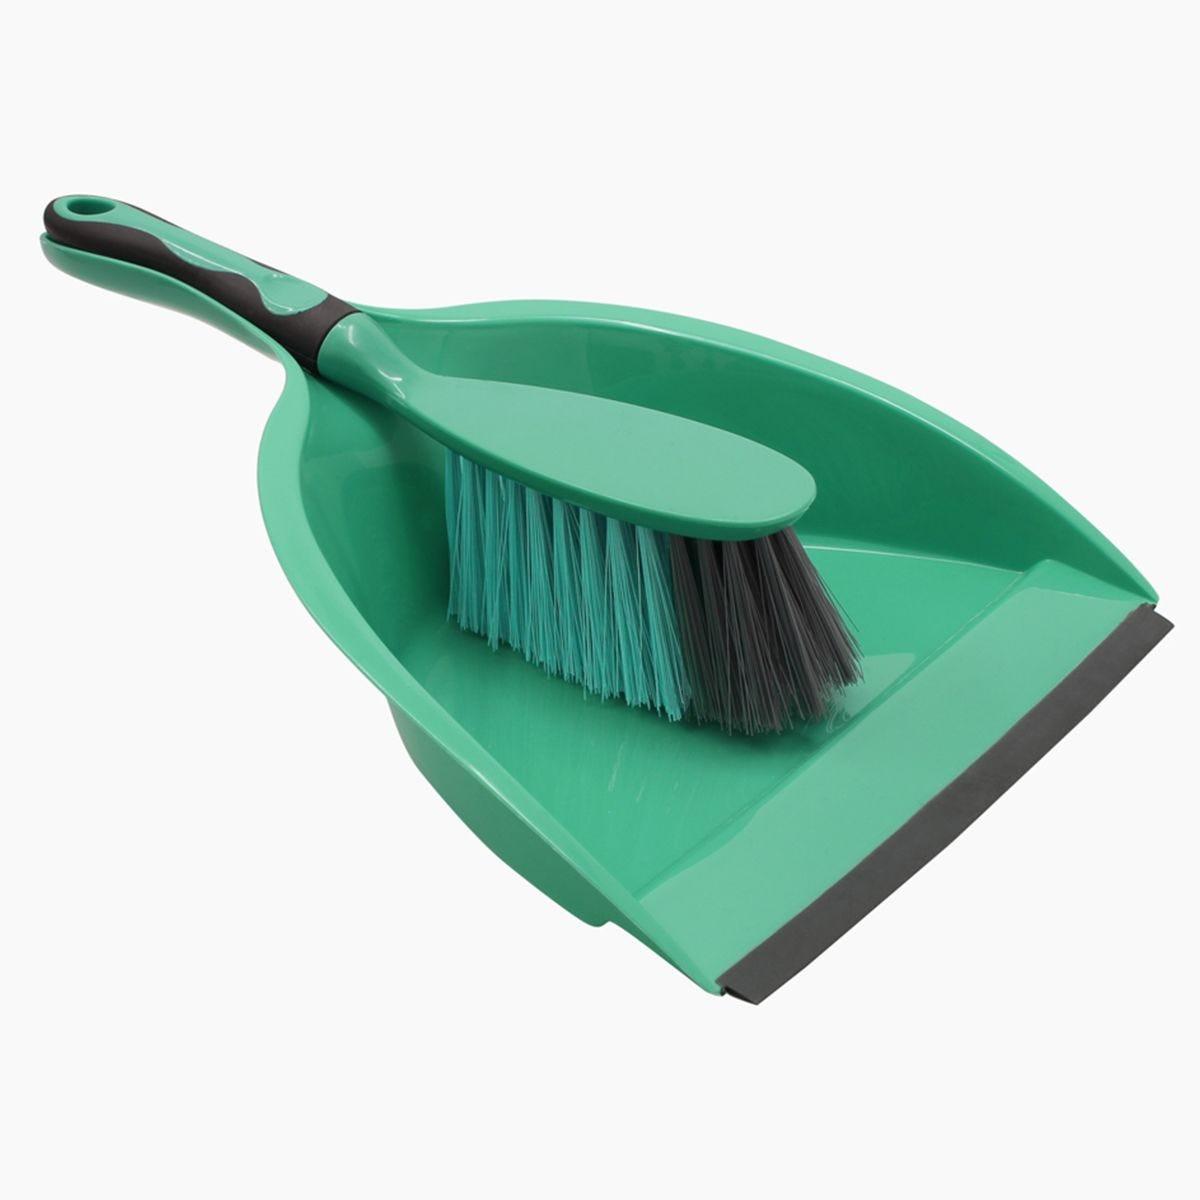 JVL Rubber Grip Dustpan and Bristle Brush Set Turquoise/Grey